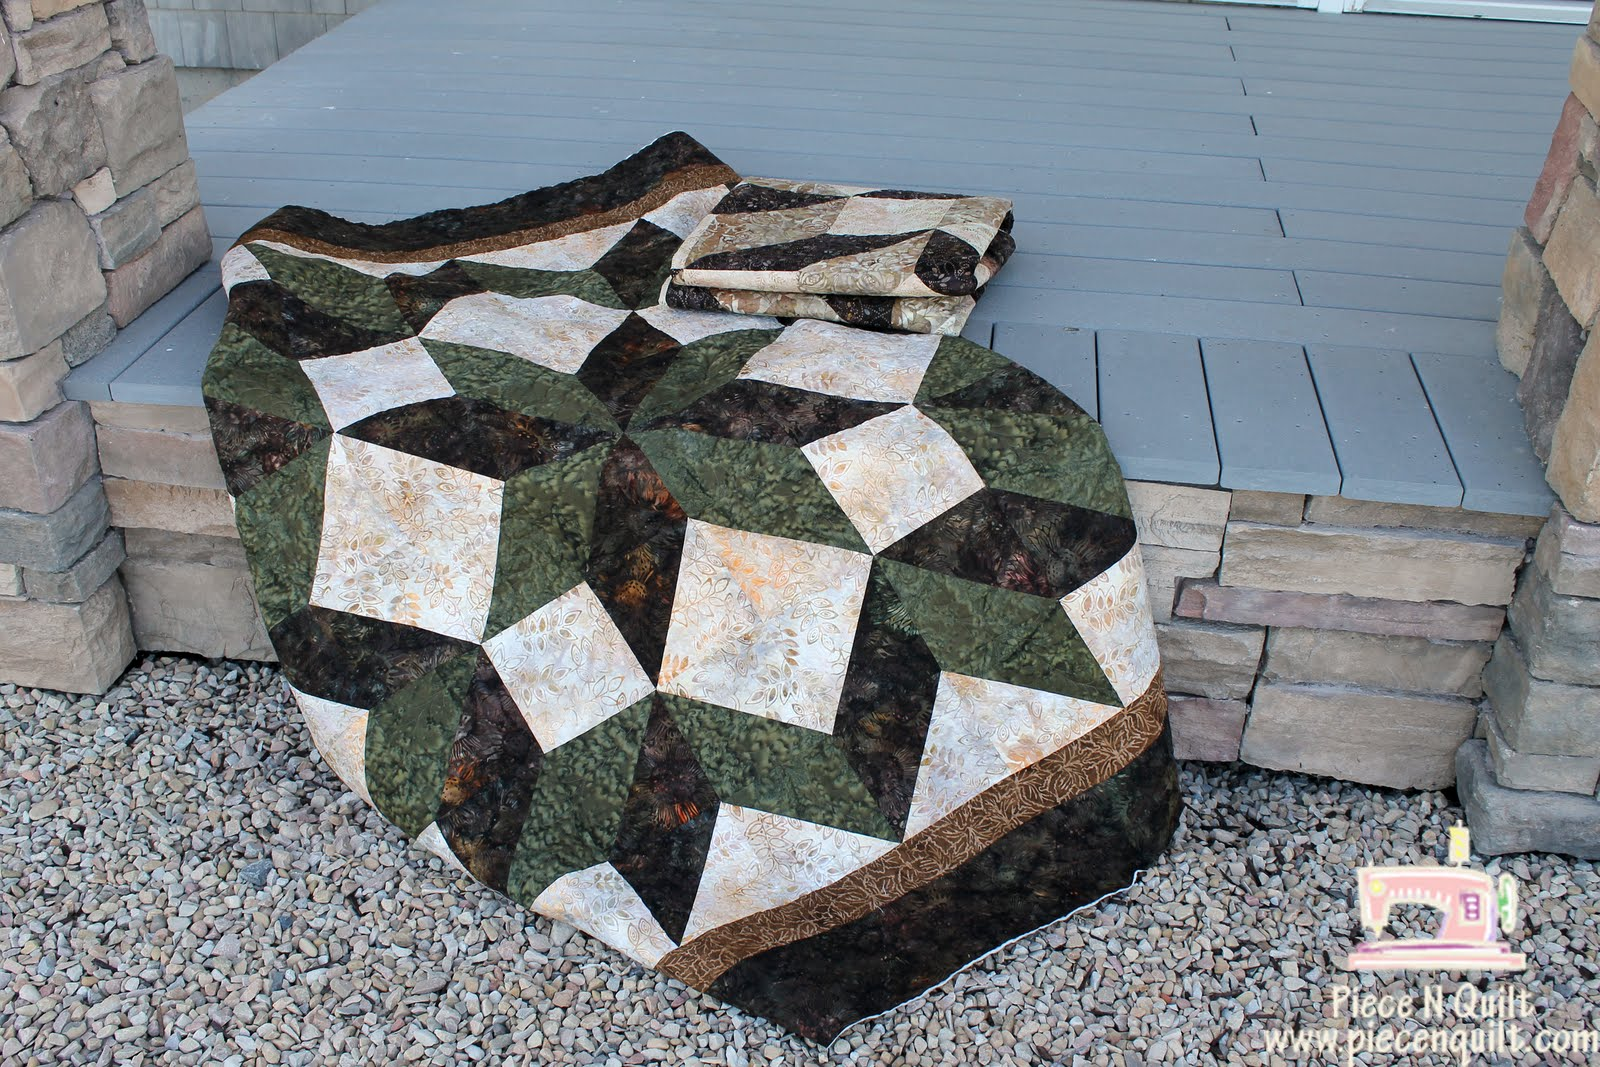 Piece N Quilt Carpenters Star Quilt